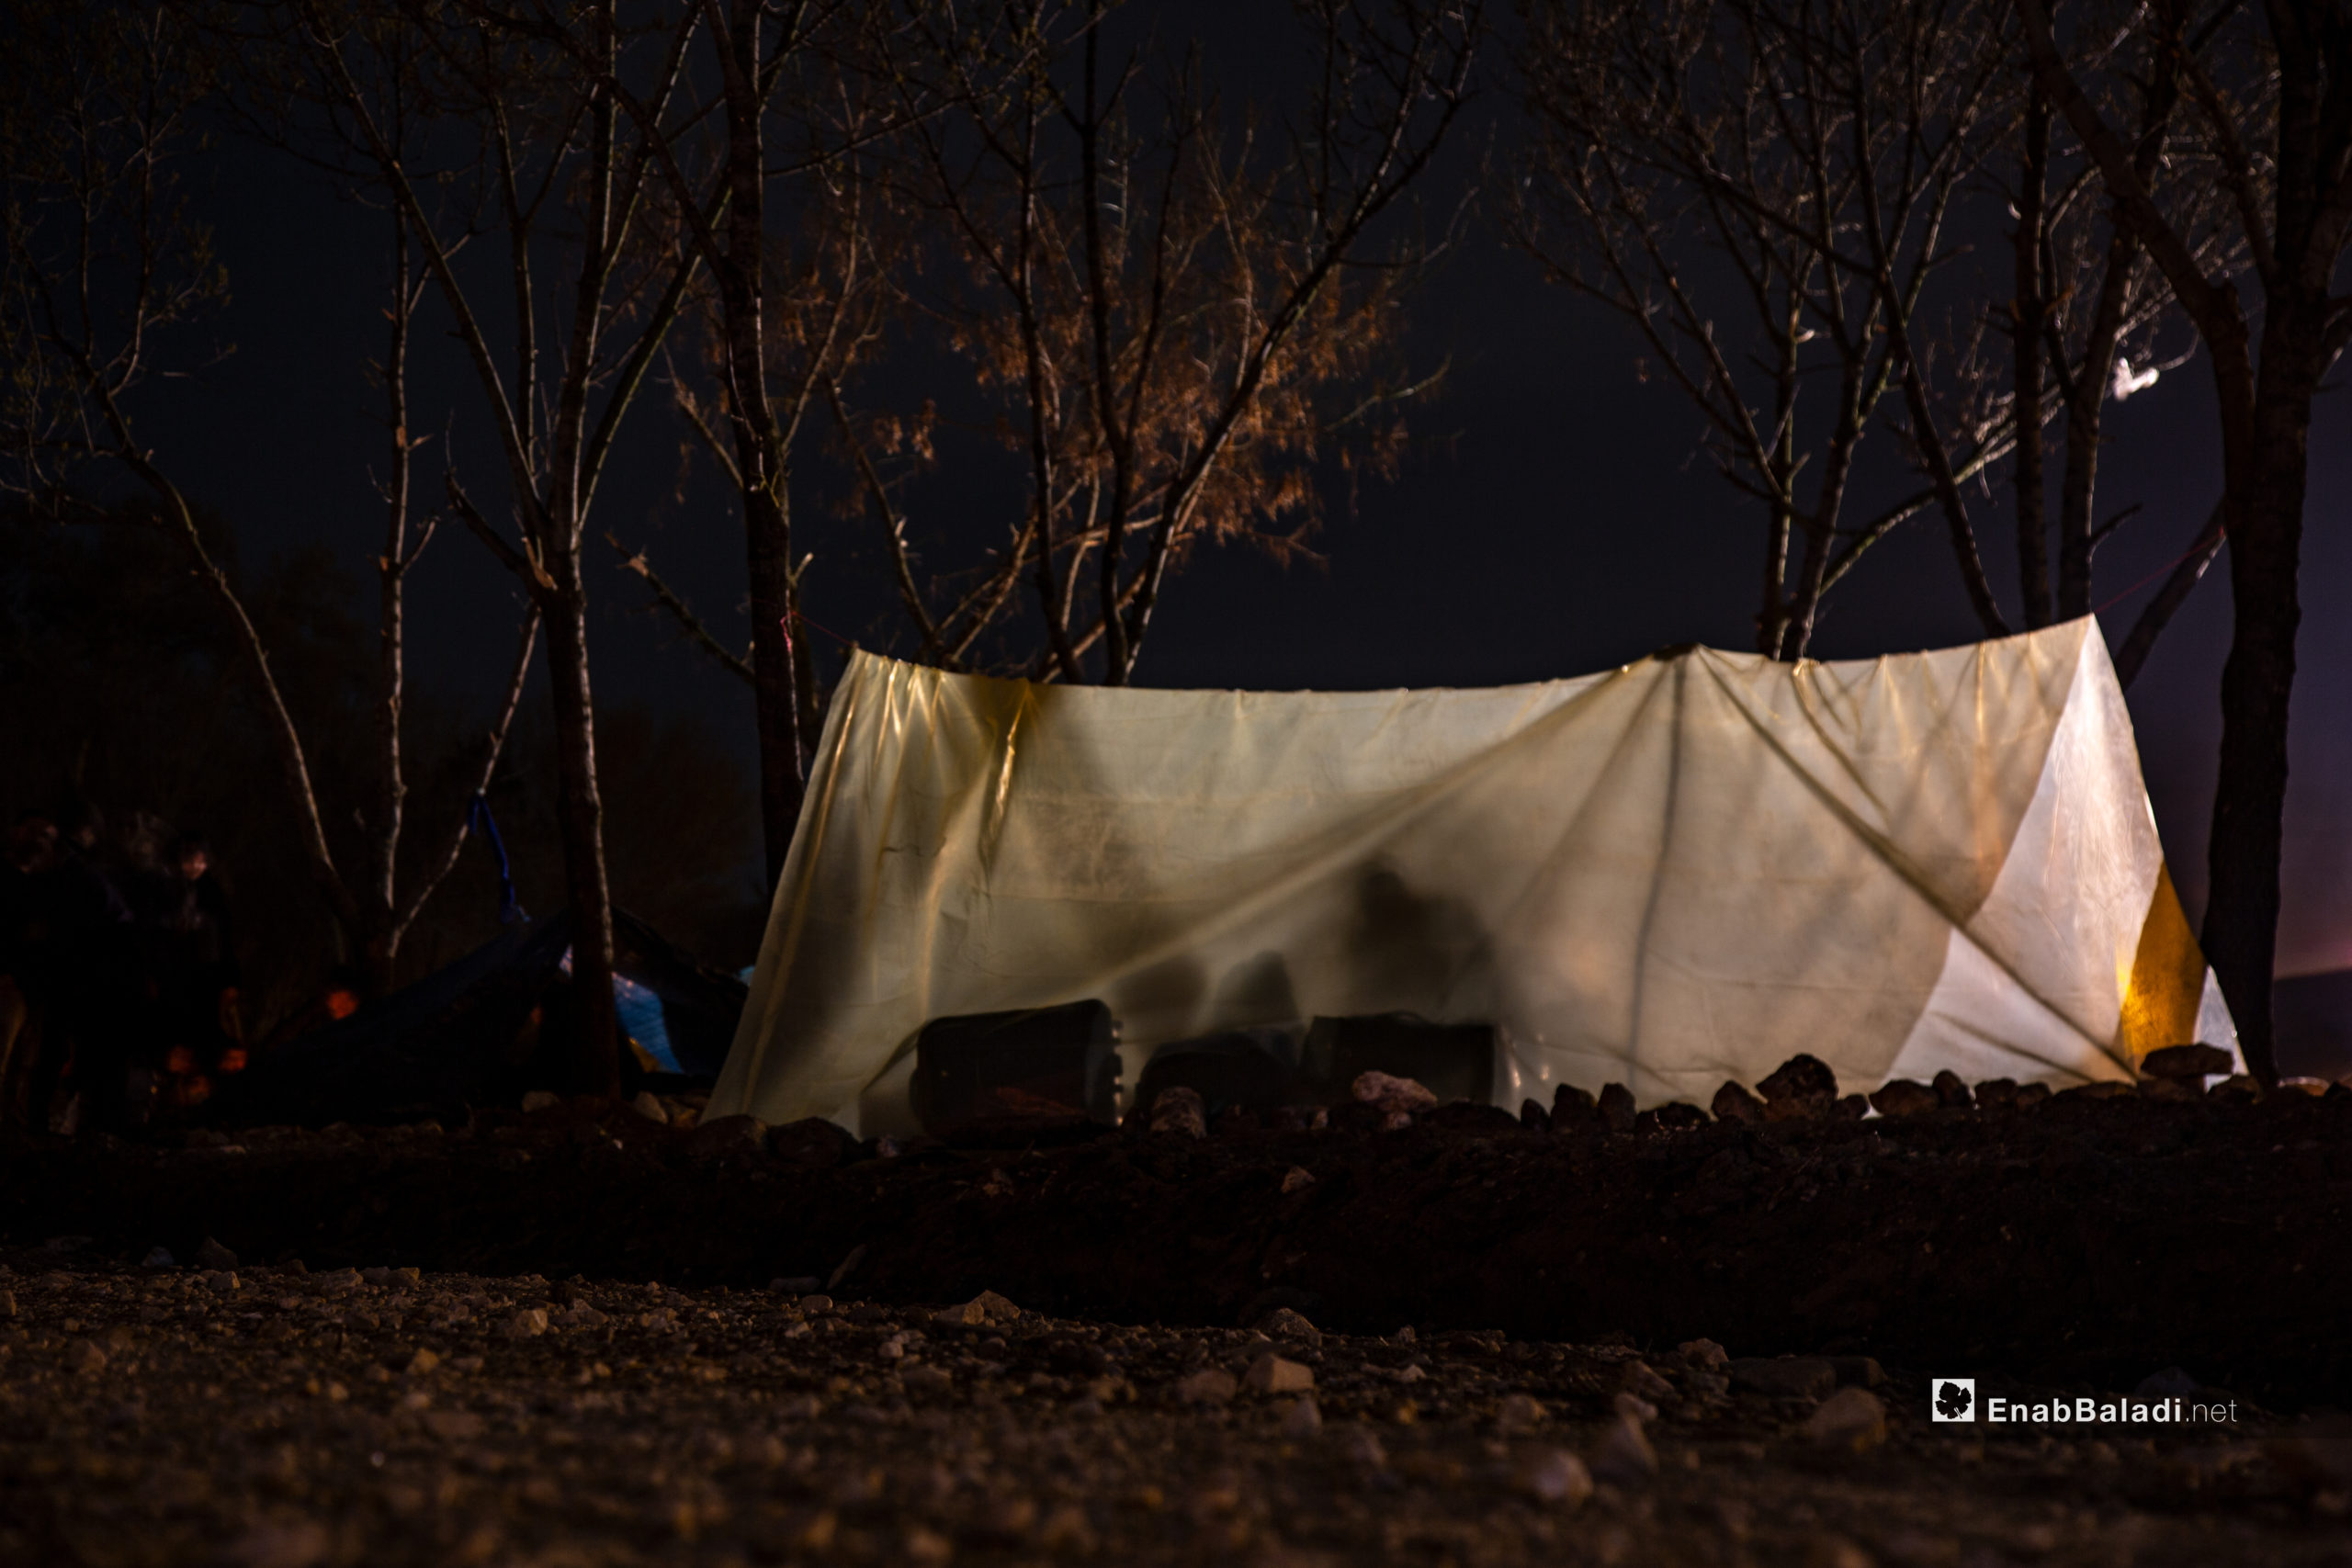 Migrants assemble on the Turkey-Greece border buffer zone near the Pazarkule crossing gate in Edirne, Turkey, hoping that Greece will open the border gate soon - 4 March 2020 (Enab Baladi)